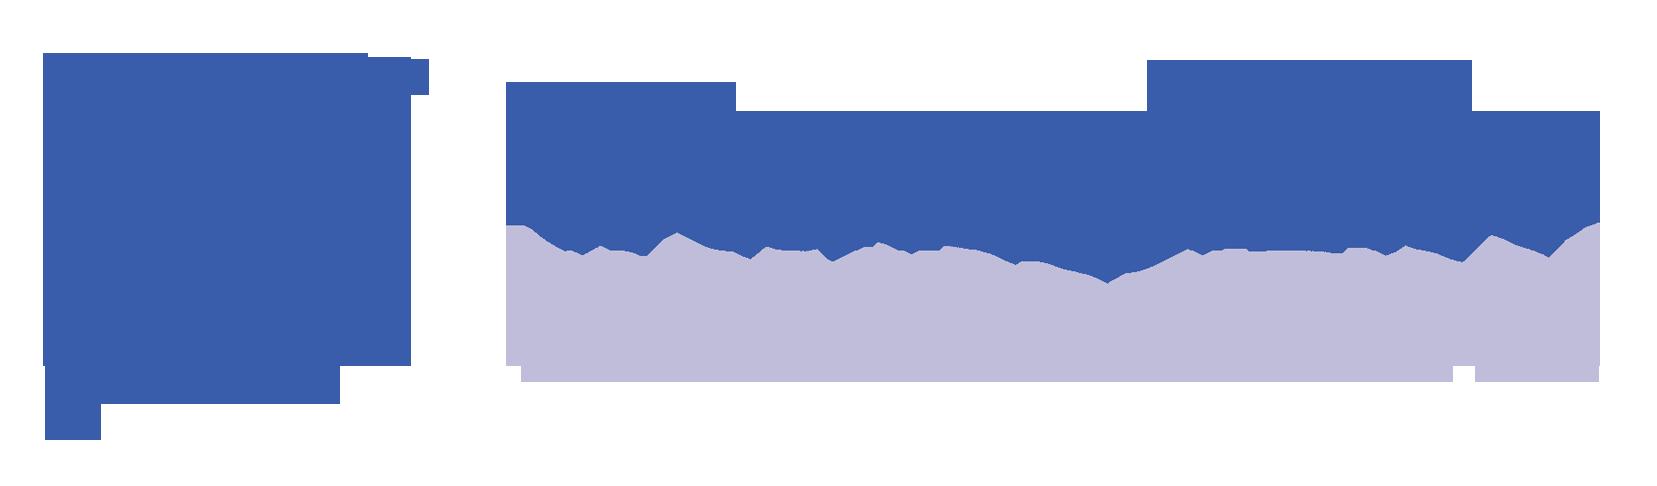 transglobe-logo_transp.png